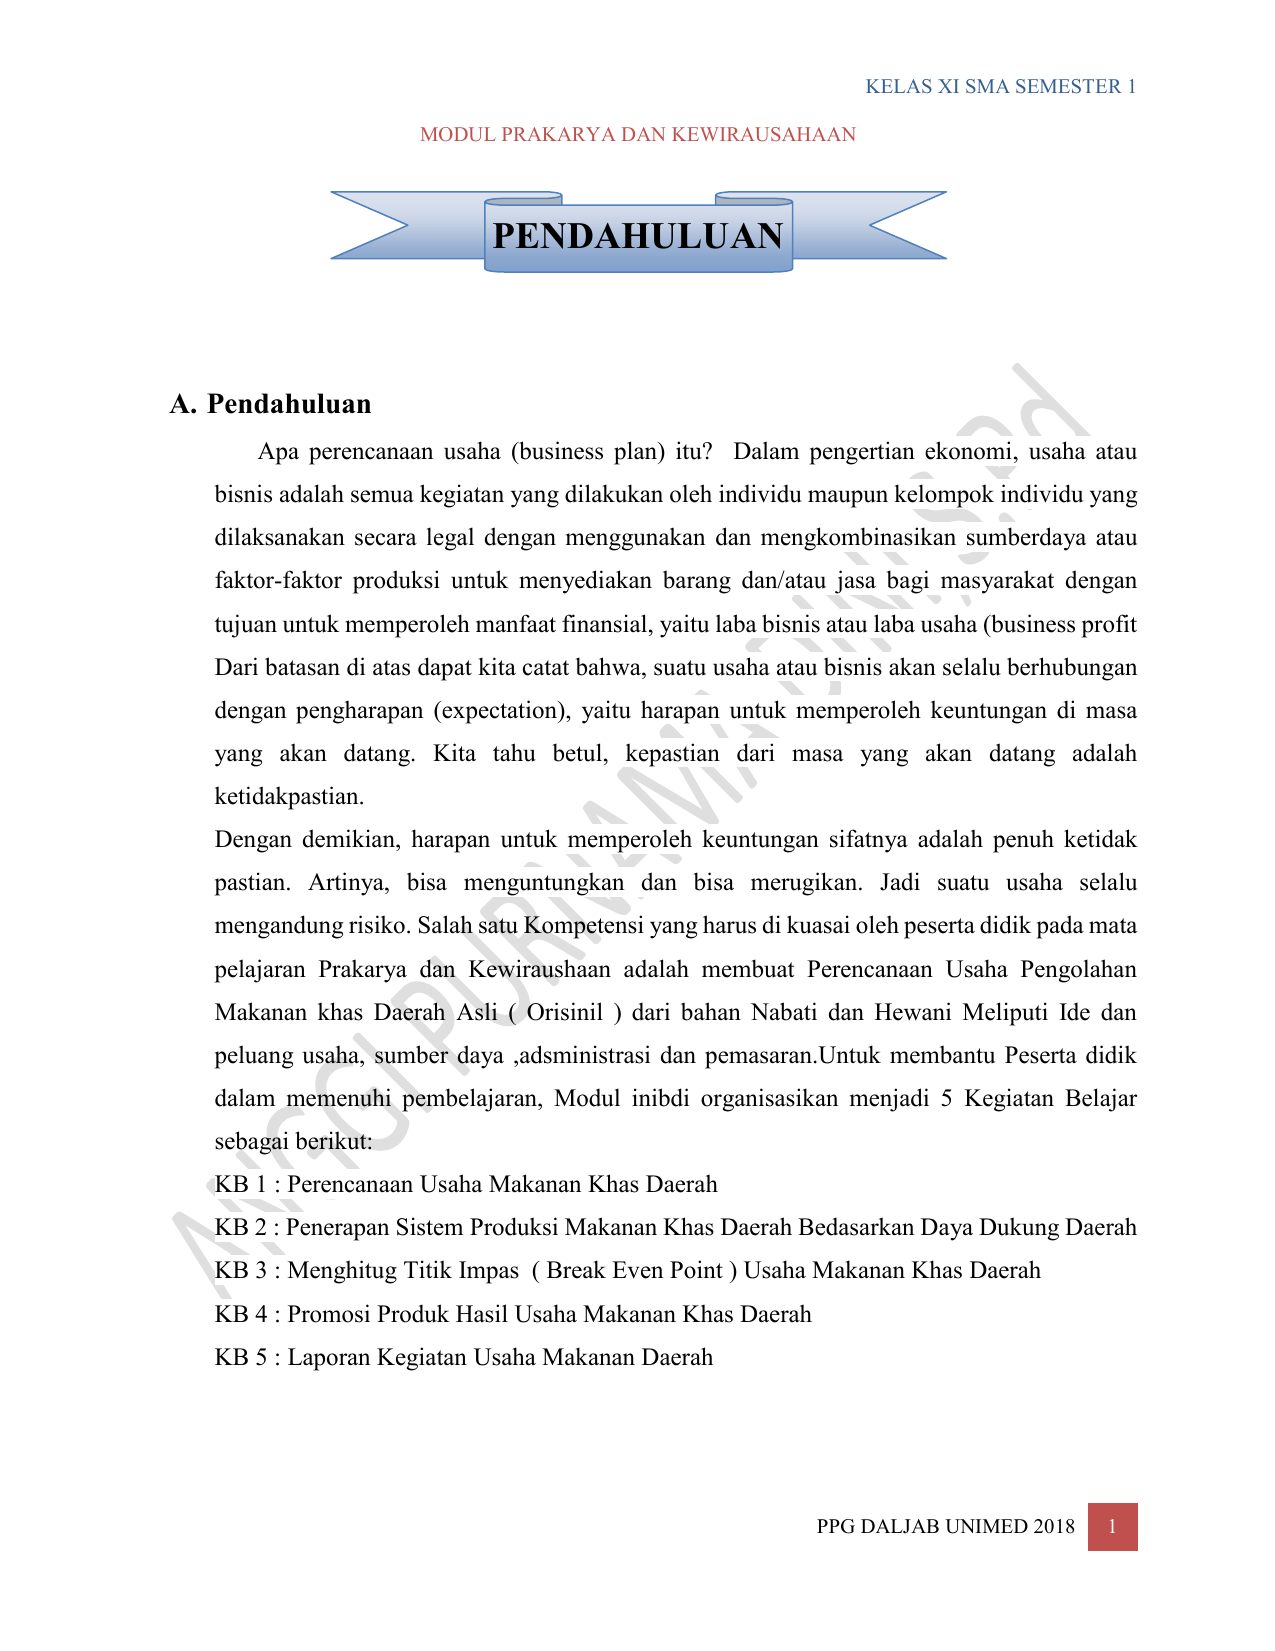 Prakarya Kelas Xi